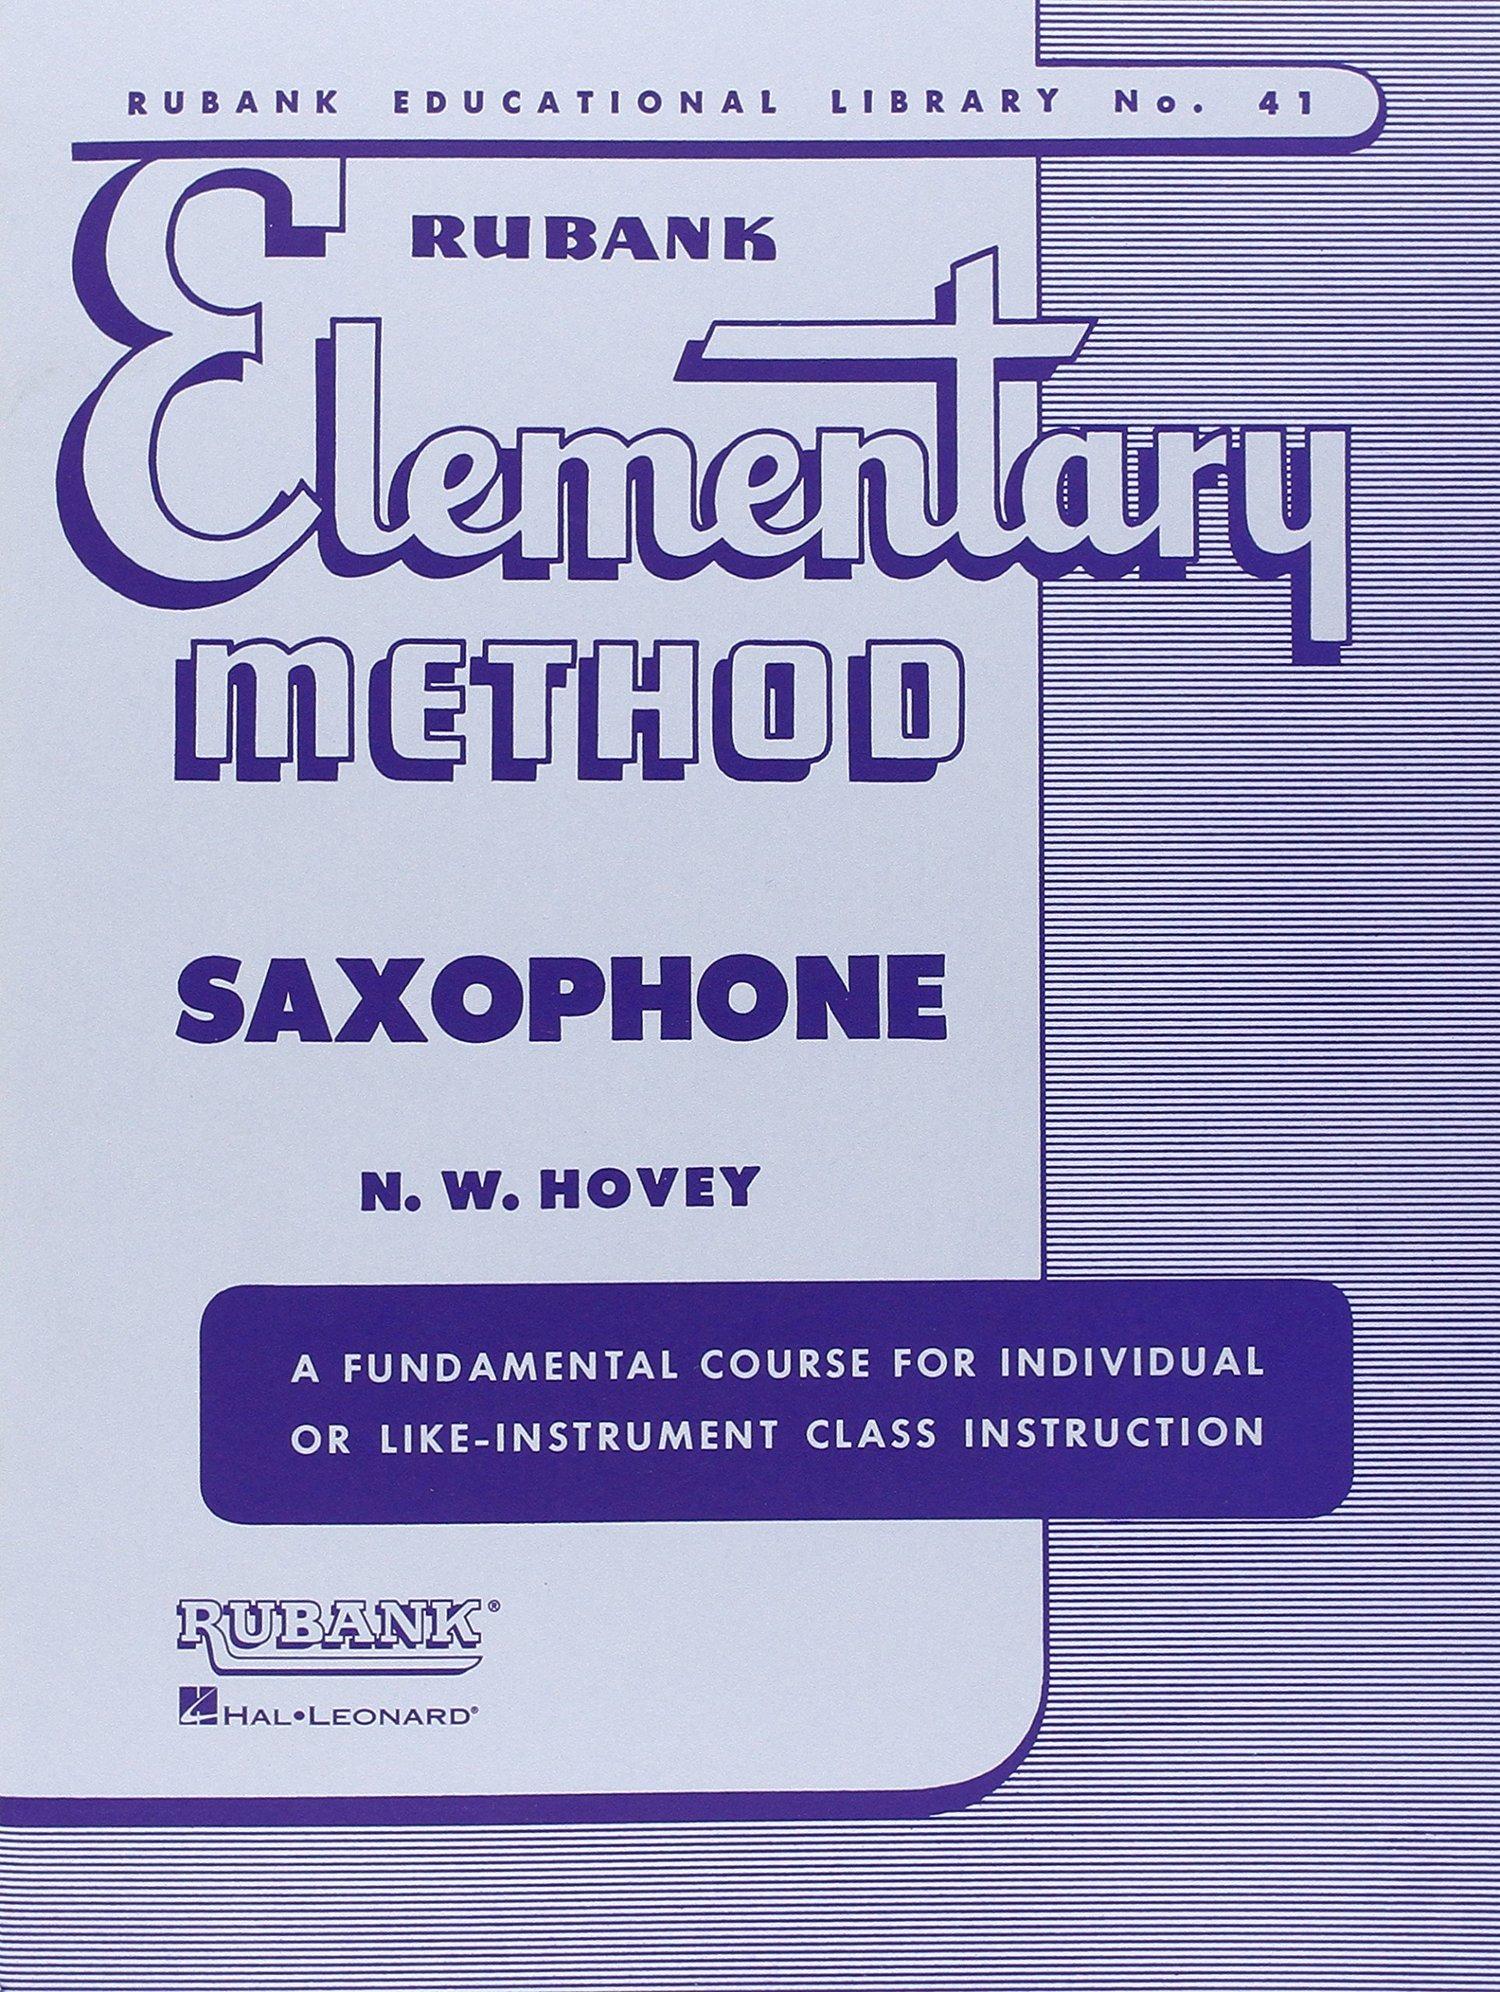 Elementary Method Saxophone